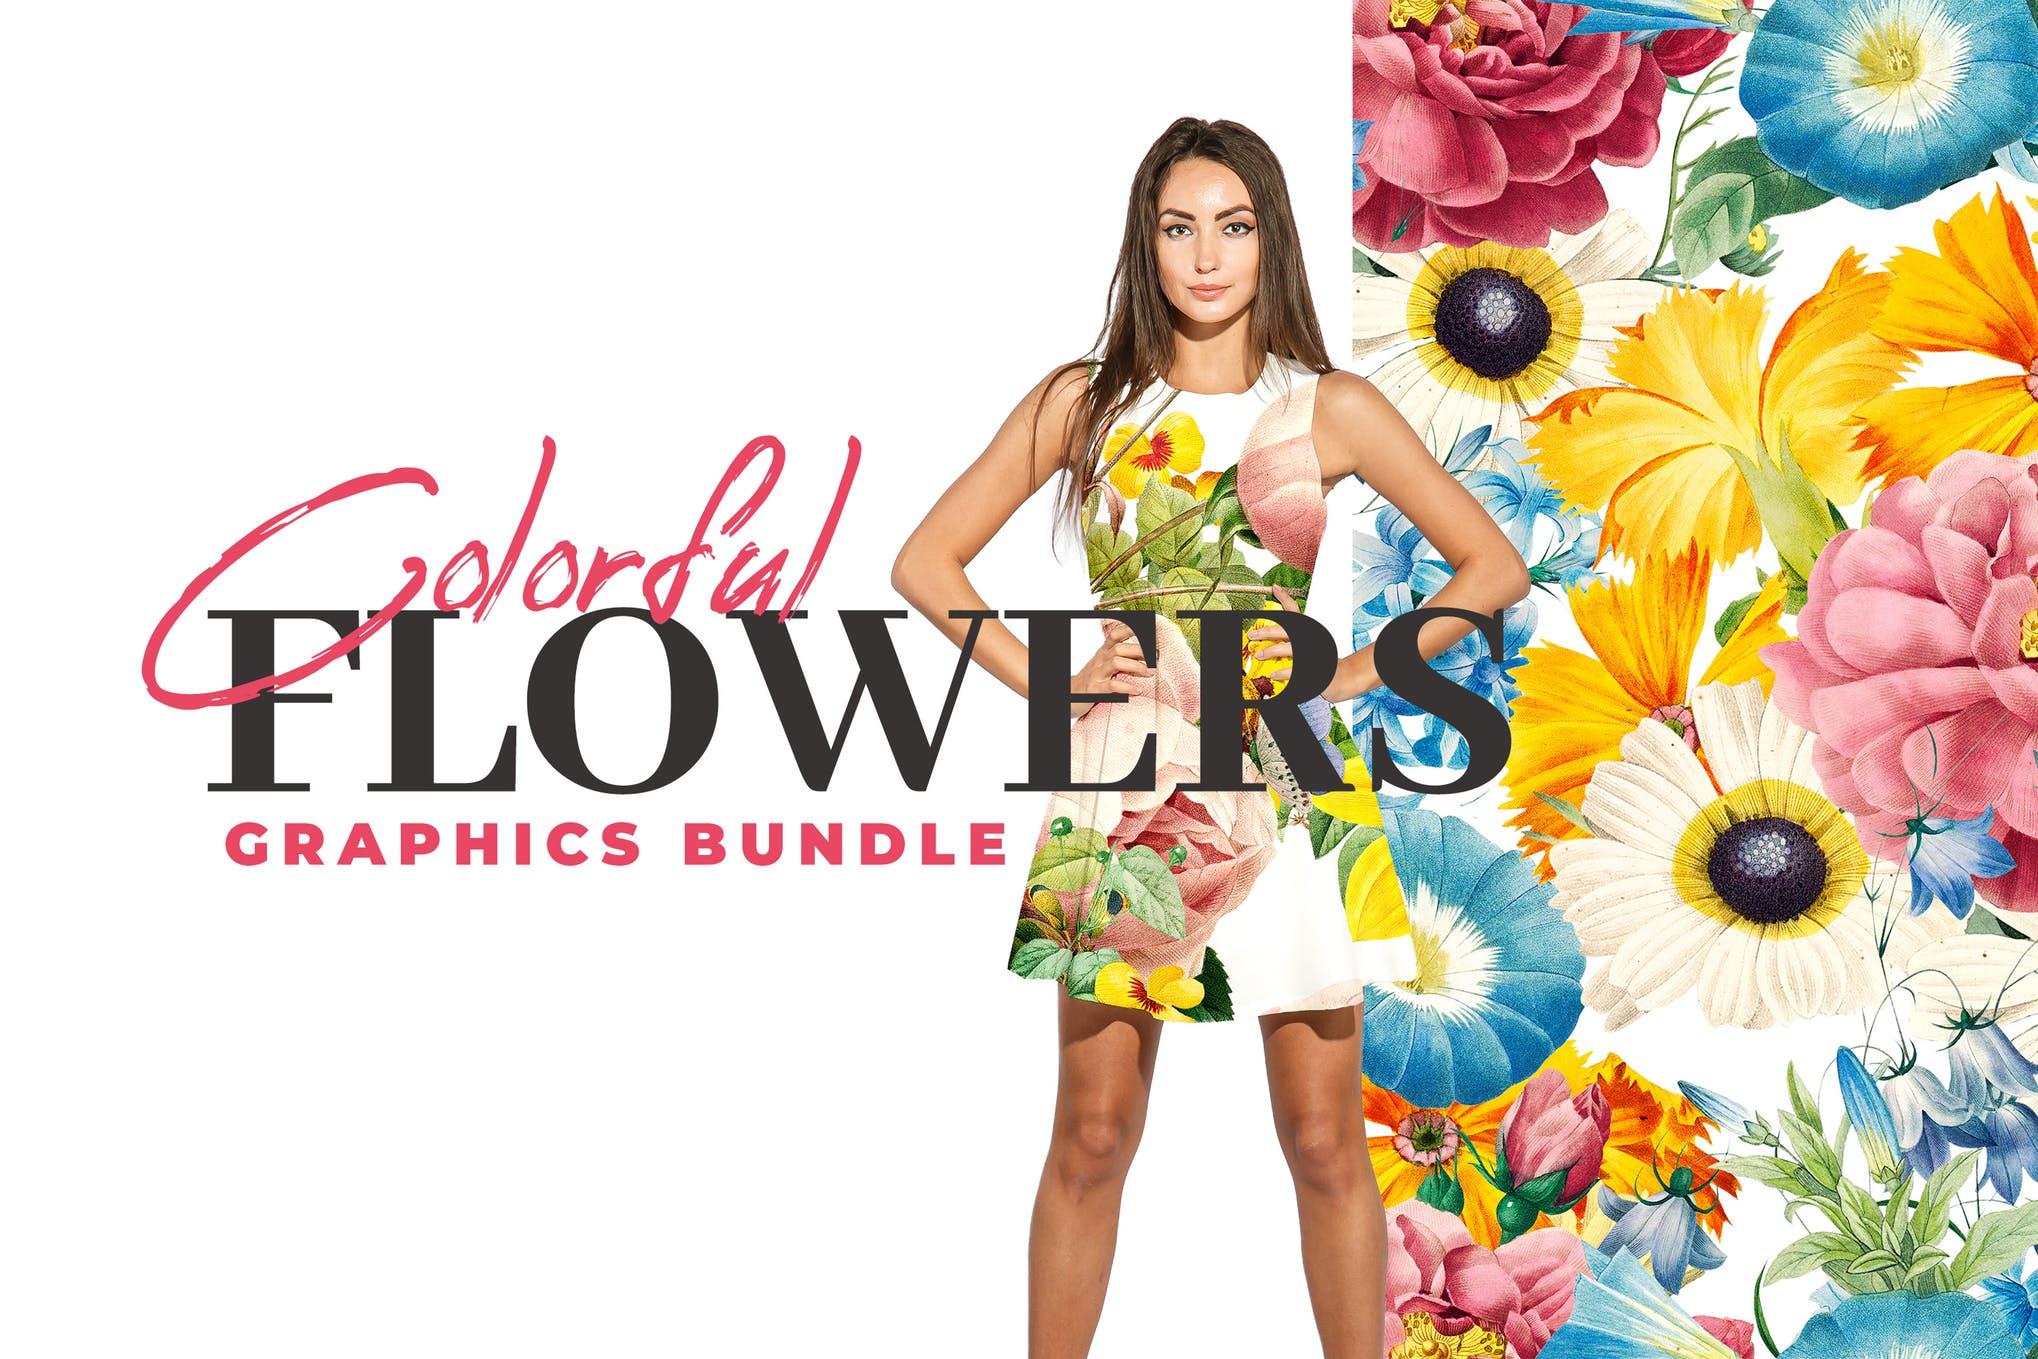 花卉图案合集服装装饰图案Colorful Flowers Clipart Collection插图